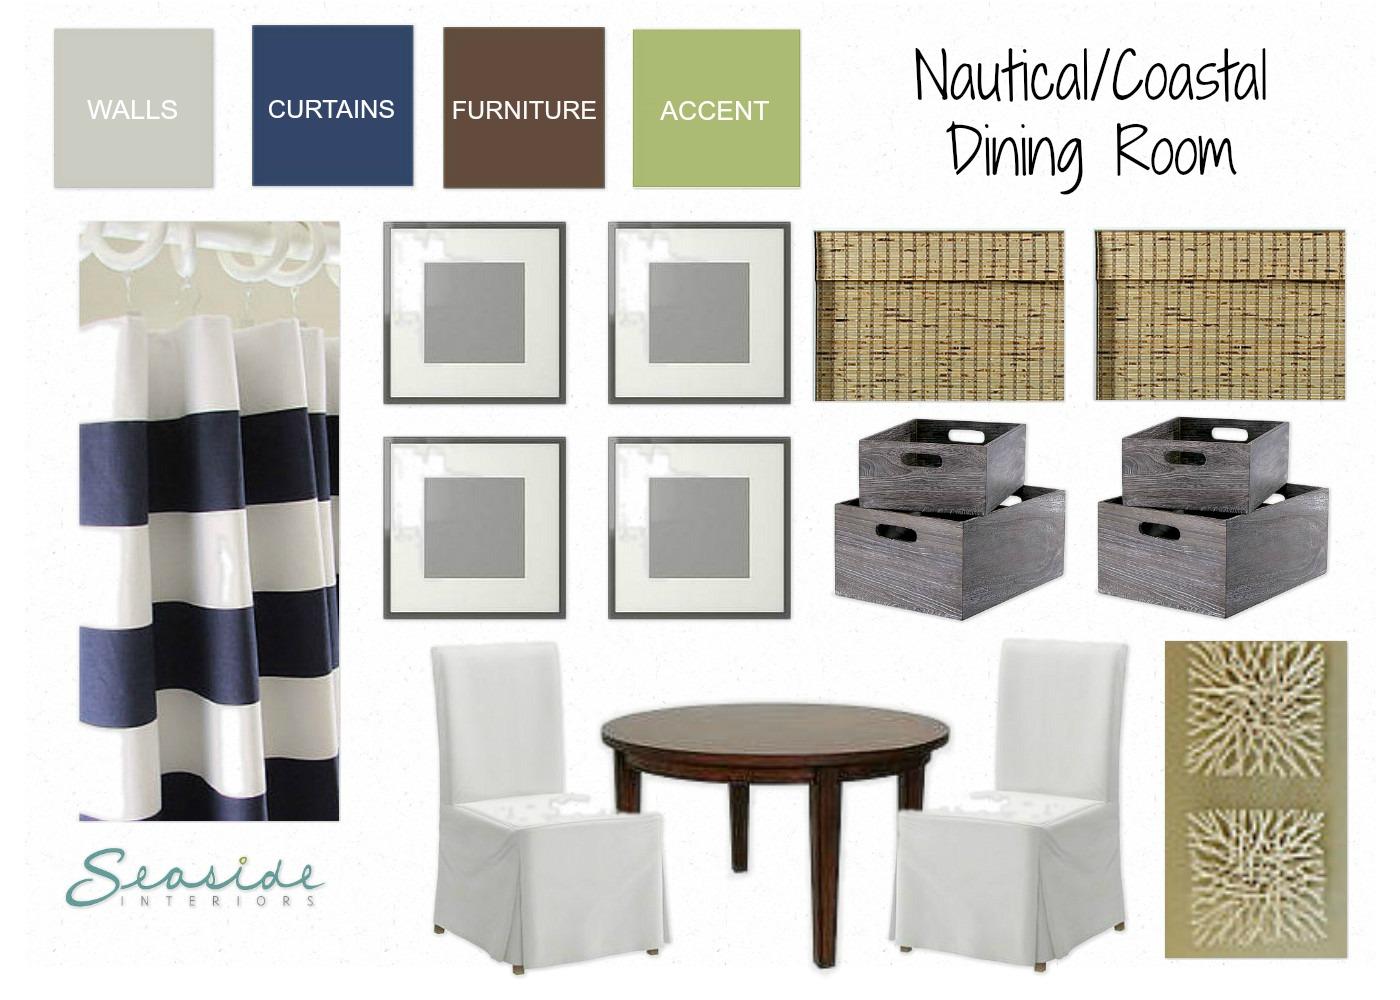 Seaside interiors nautical coastal dining room design for Home interiors new name